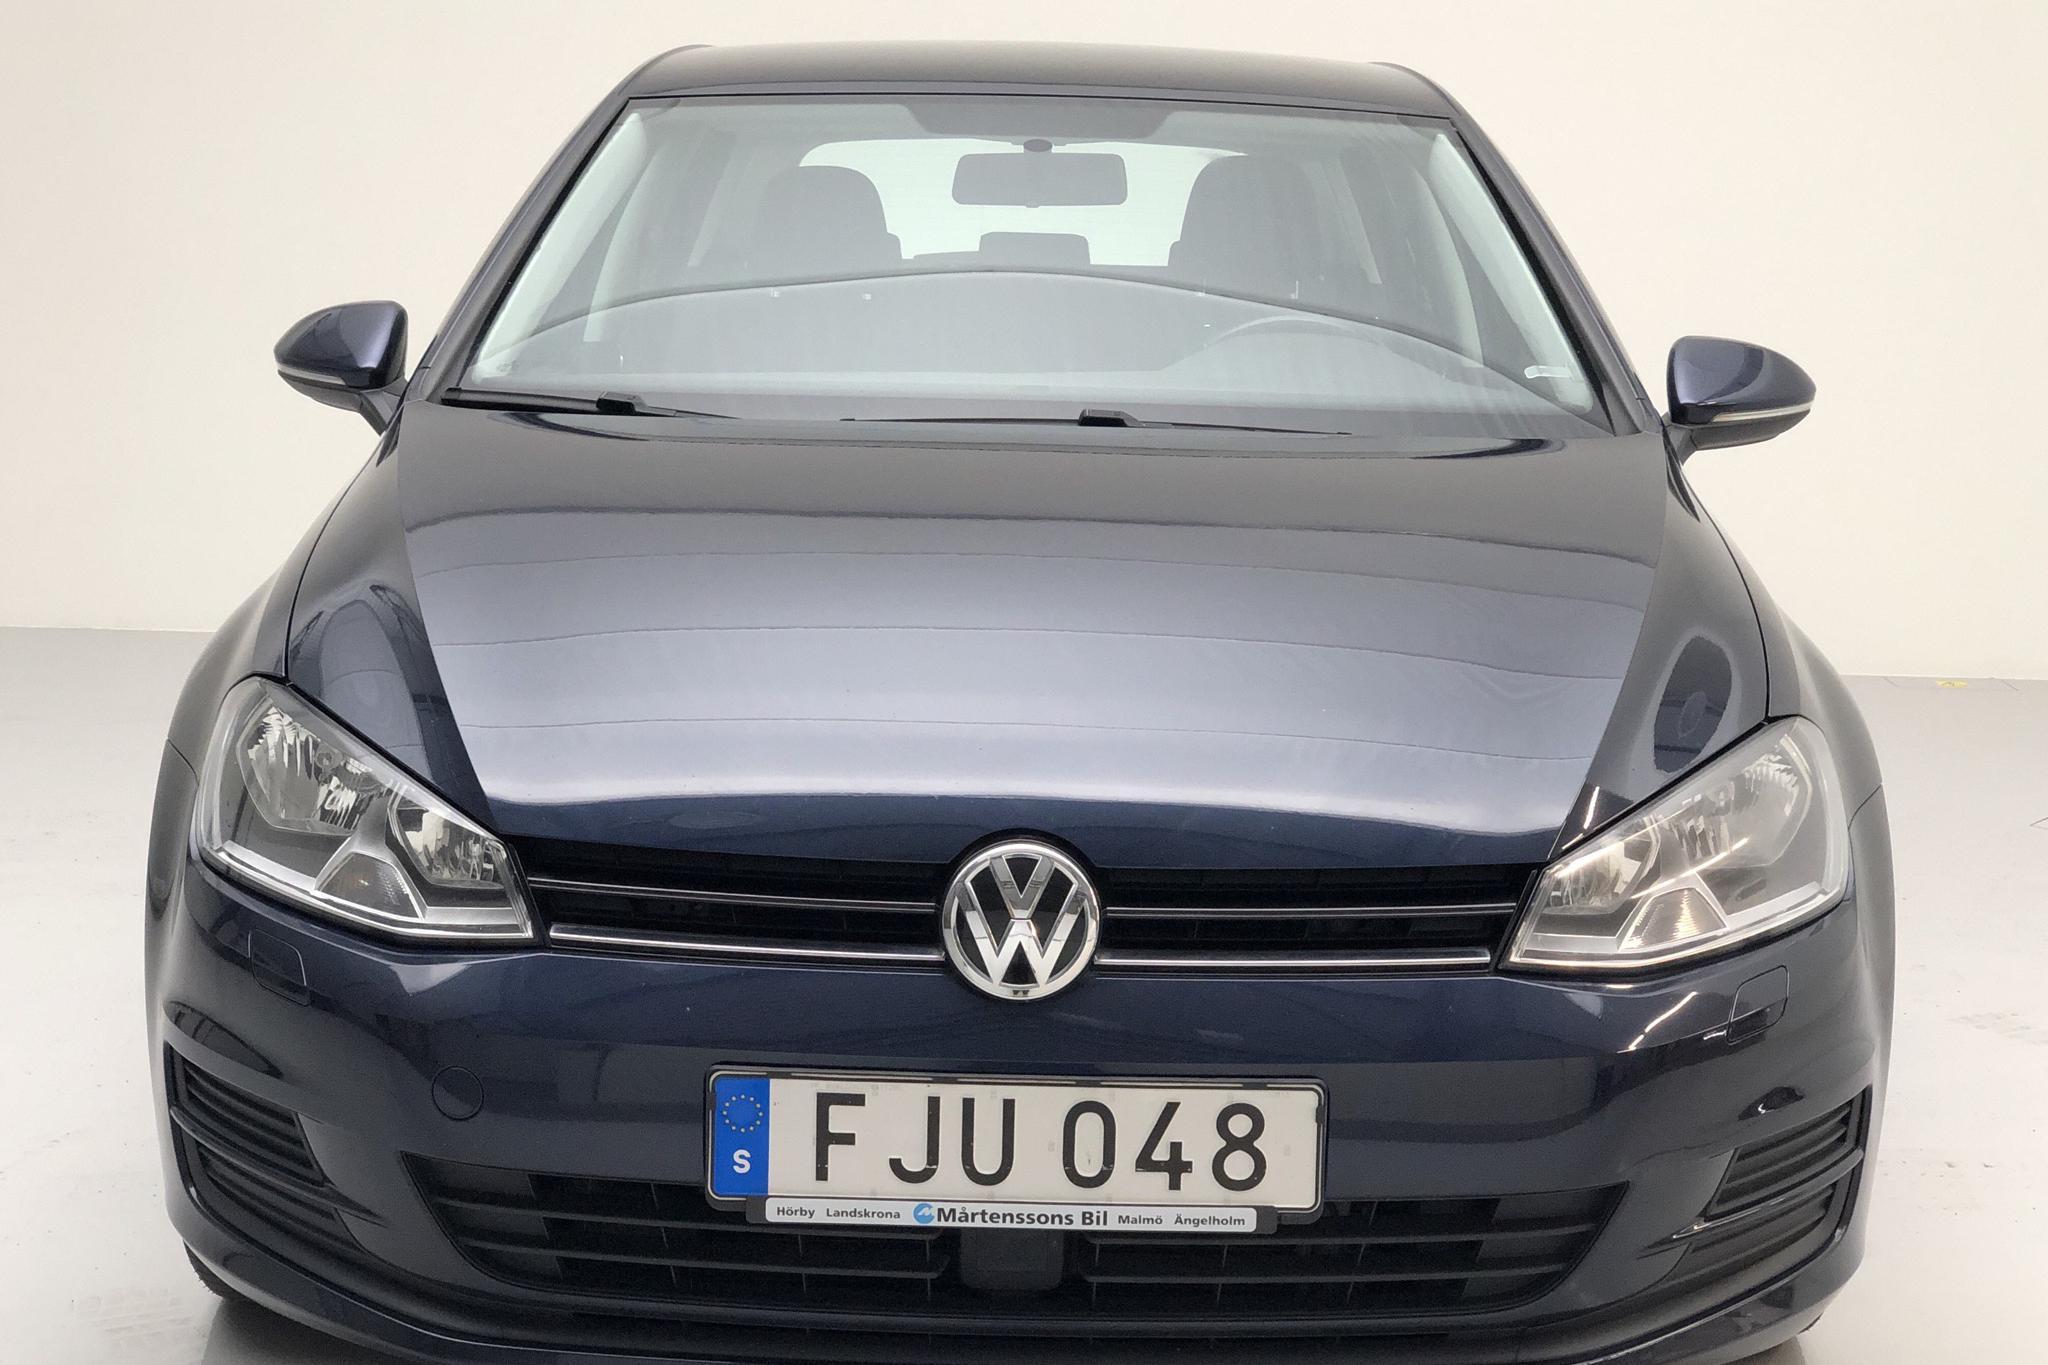 VW Golf VII 1.6 TDI BlueMotion Technology 5dr (105hk) - 8 500 mil - Manuell - Dark Blue - 2014